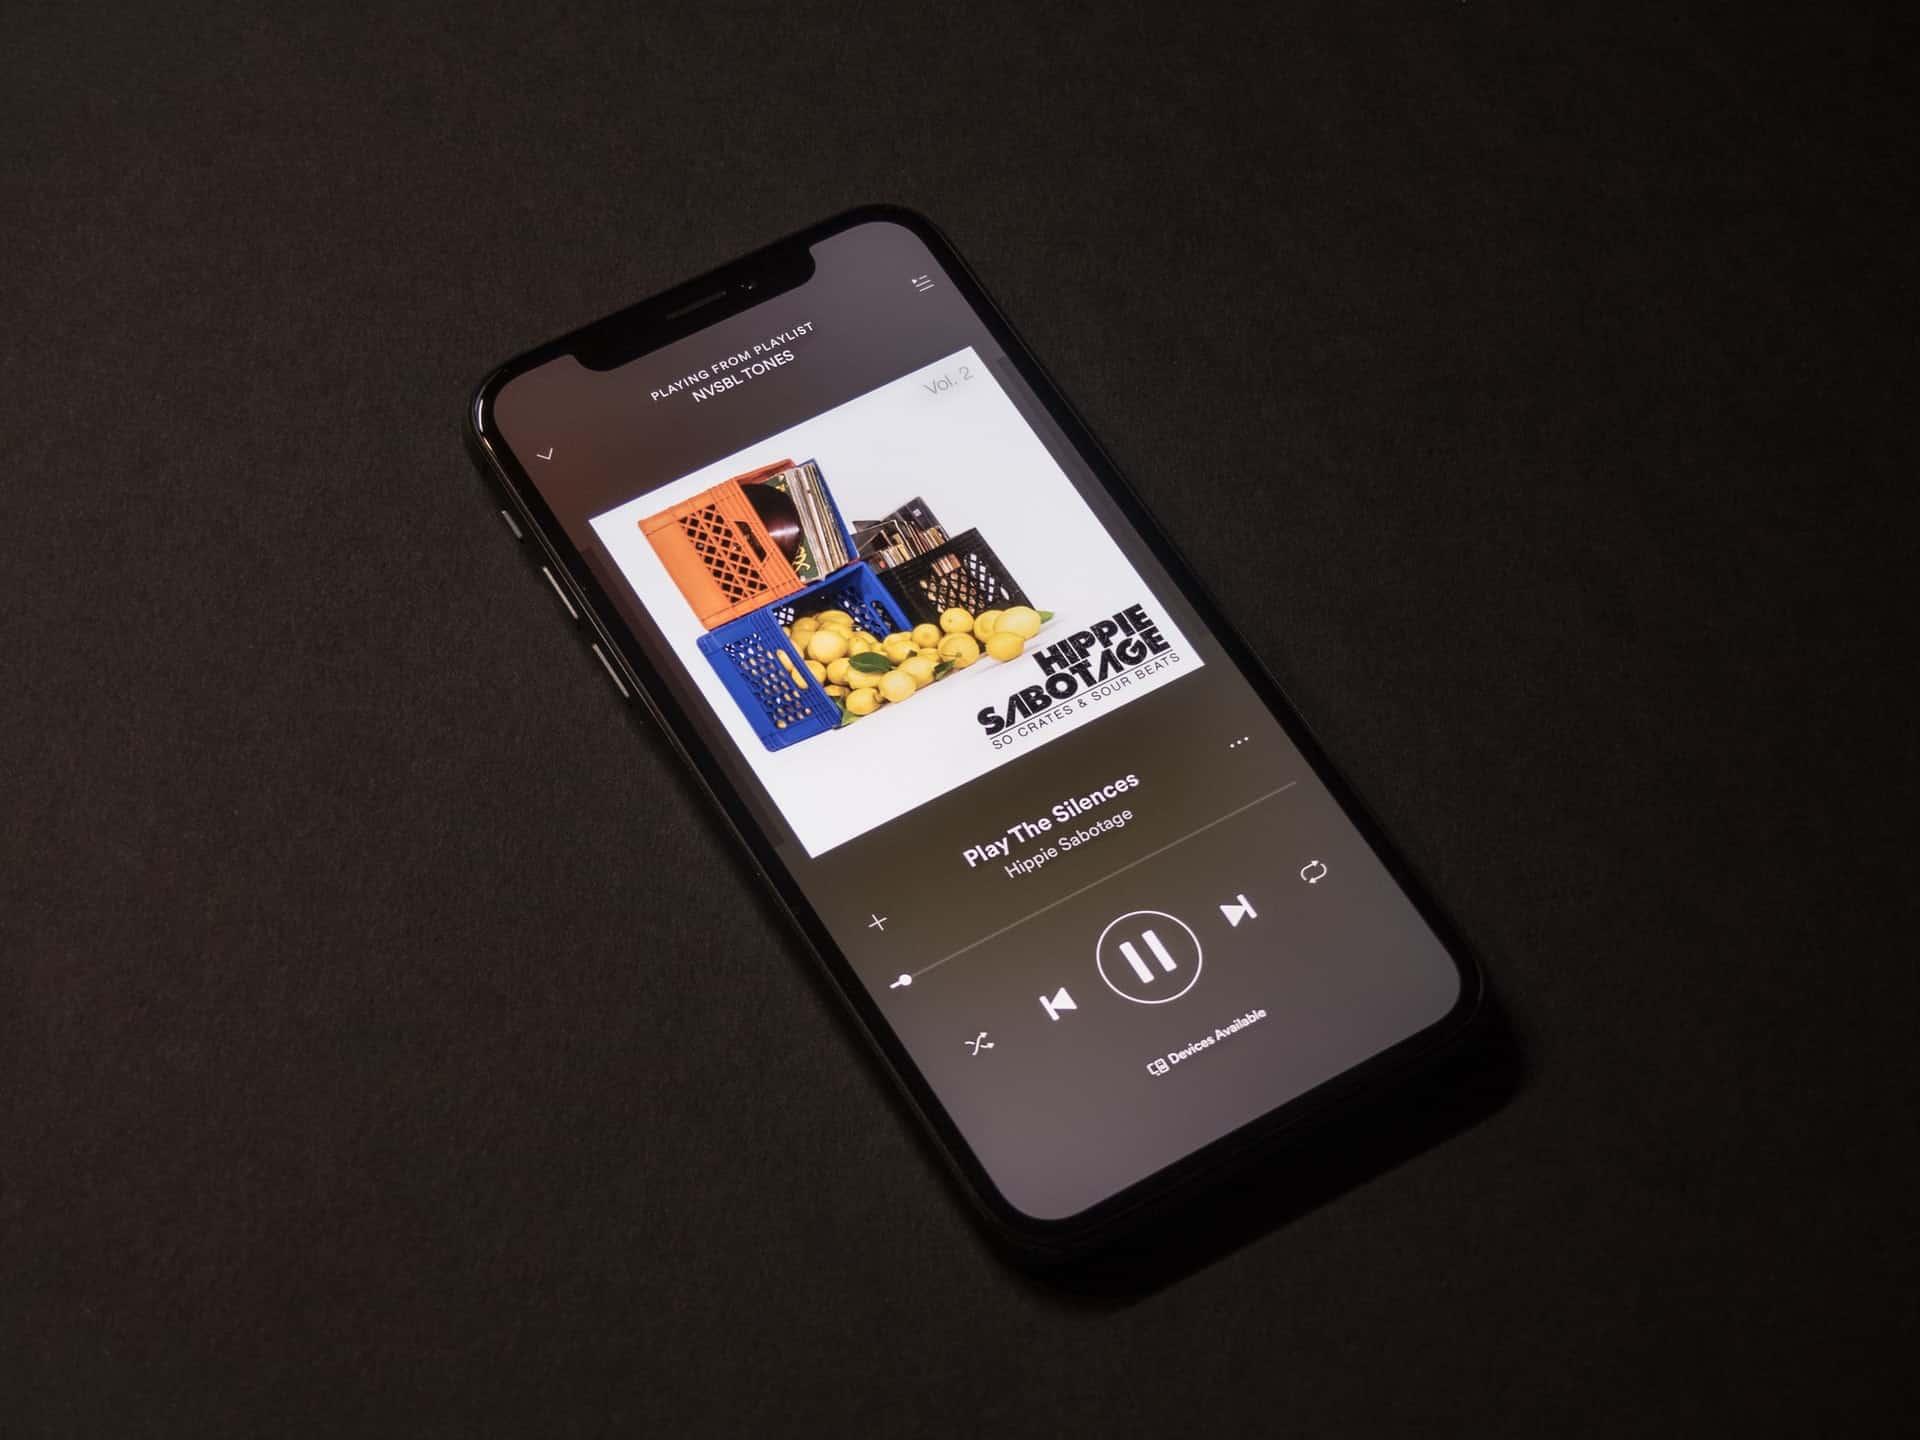 Phone playing Spotify